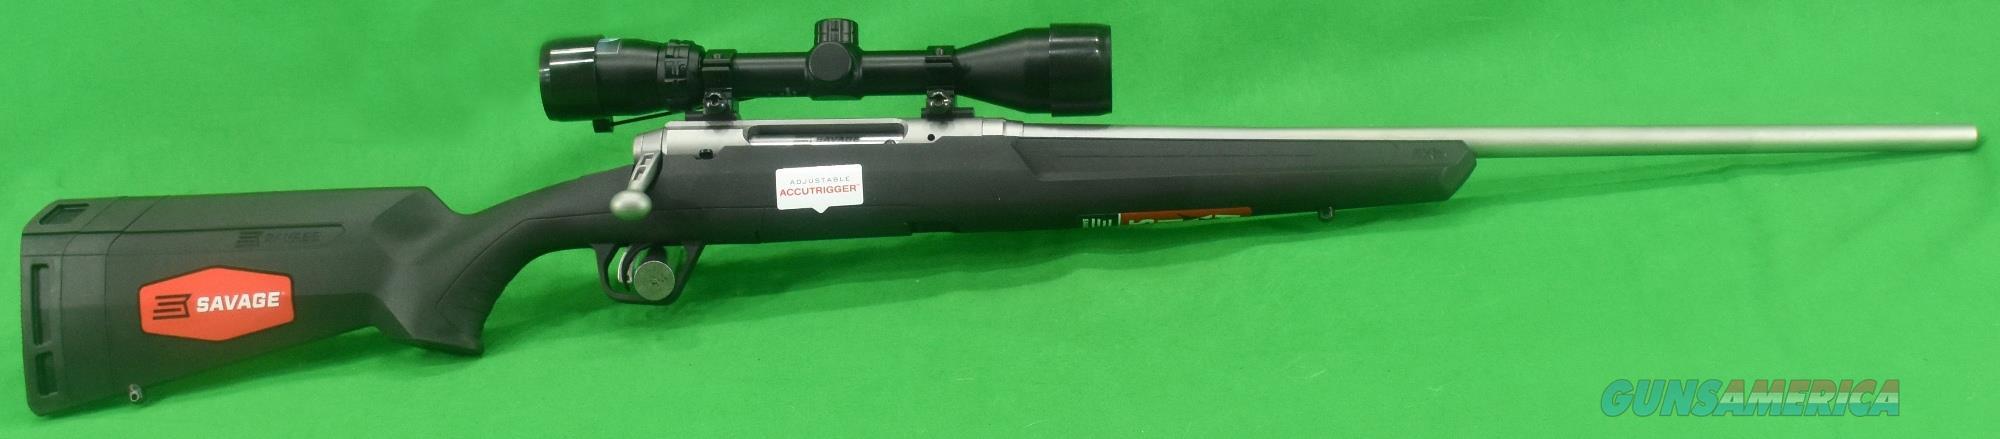 Axis II XP Stainless 7mm-08 22In  57105  Guns > Rifles > Savage Rifles > Axis